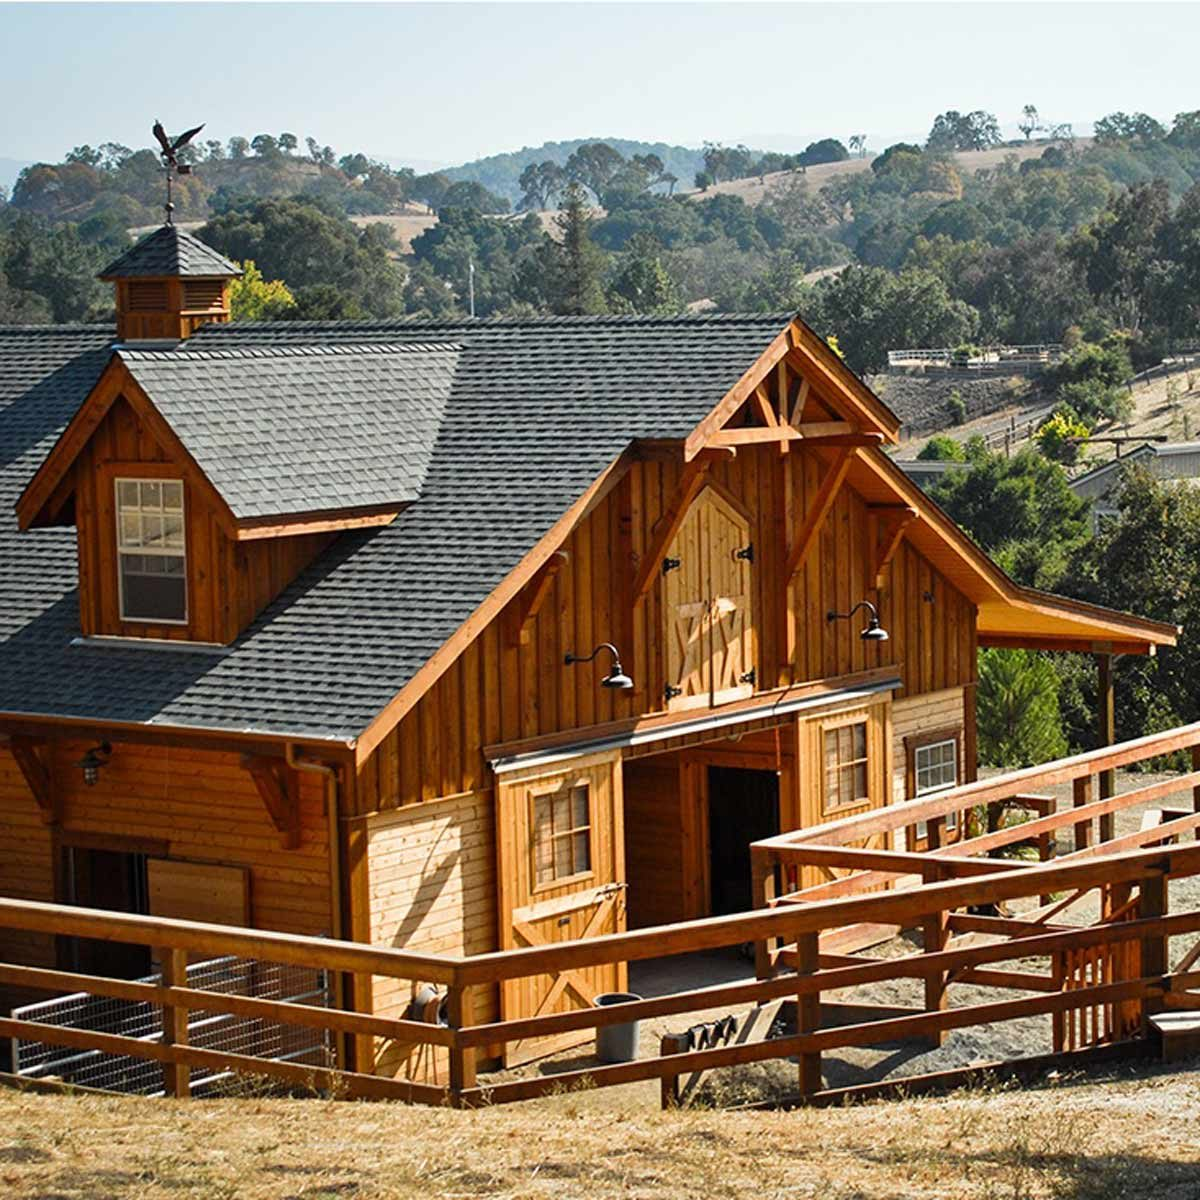 woodside-california-horse-barn